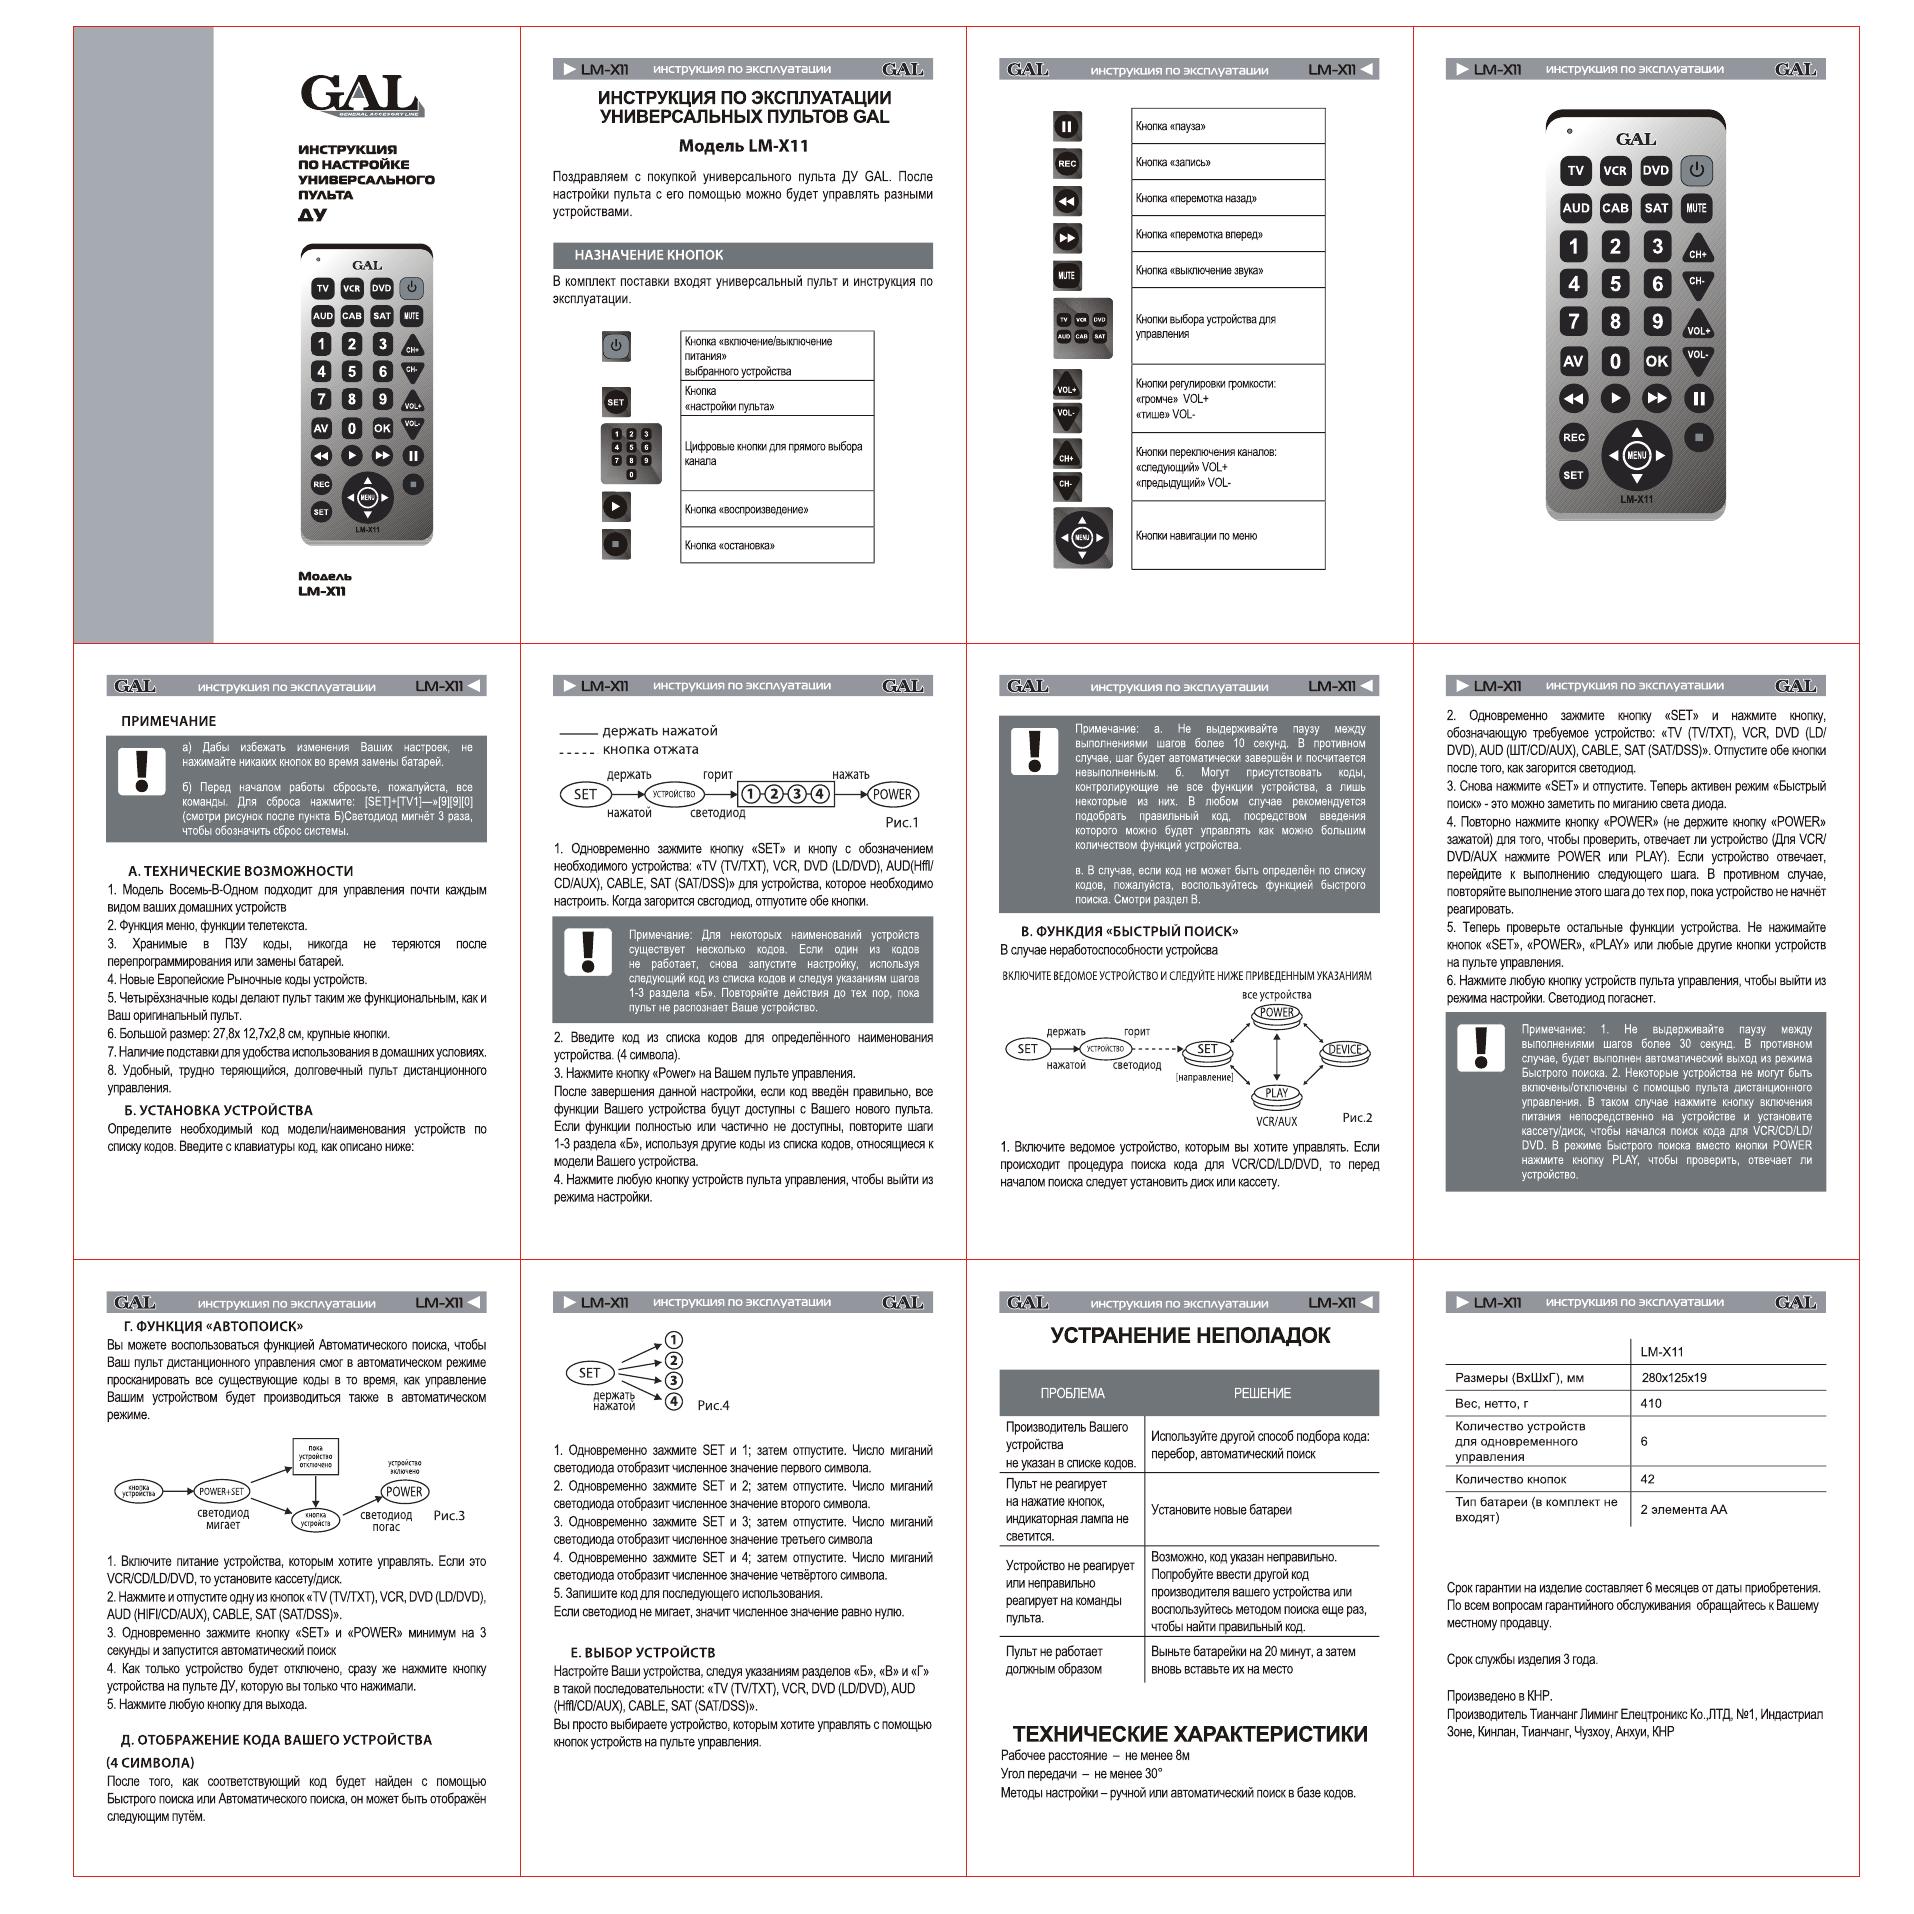 Инструкция для пульта gal lm x11